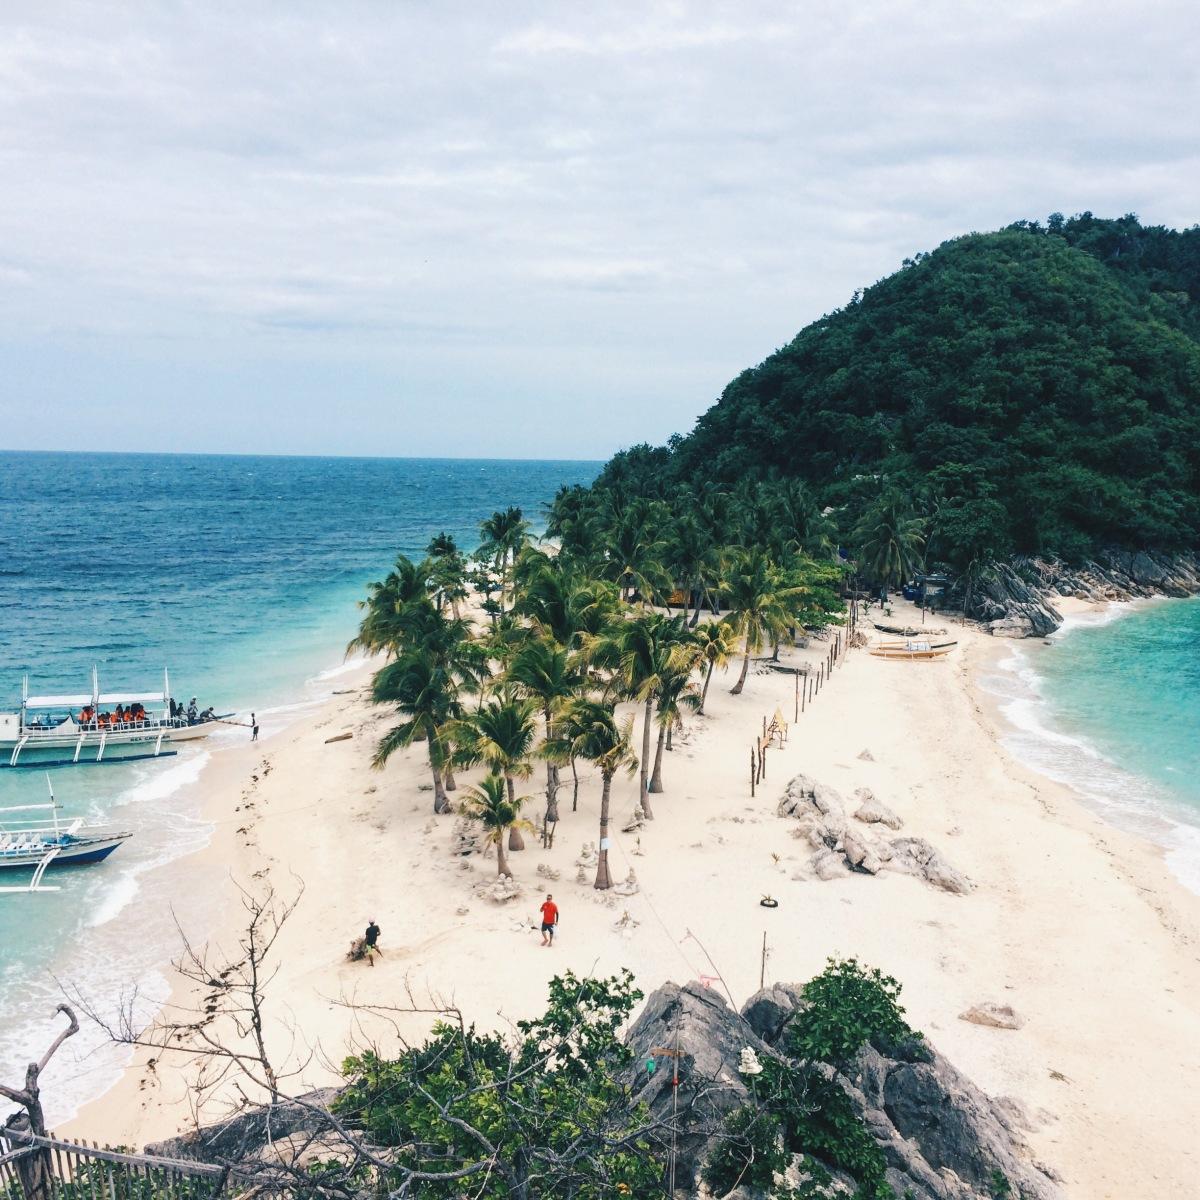 Beach Island: Islas De Gigantes Carles Iloilo: A DIY Travel Guide To The